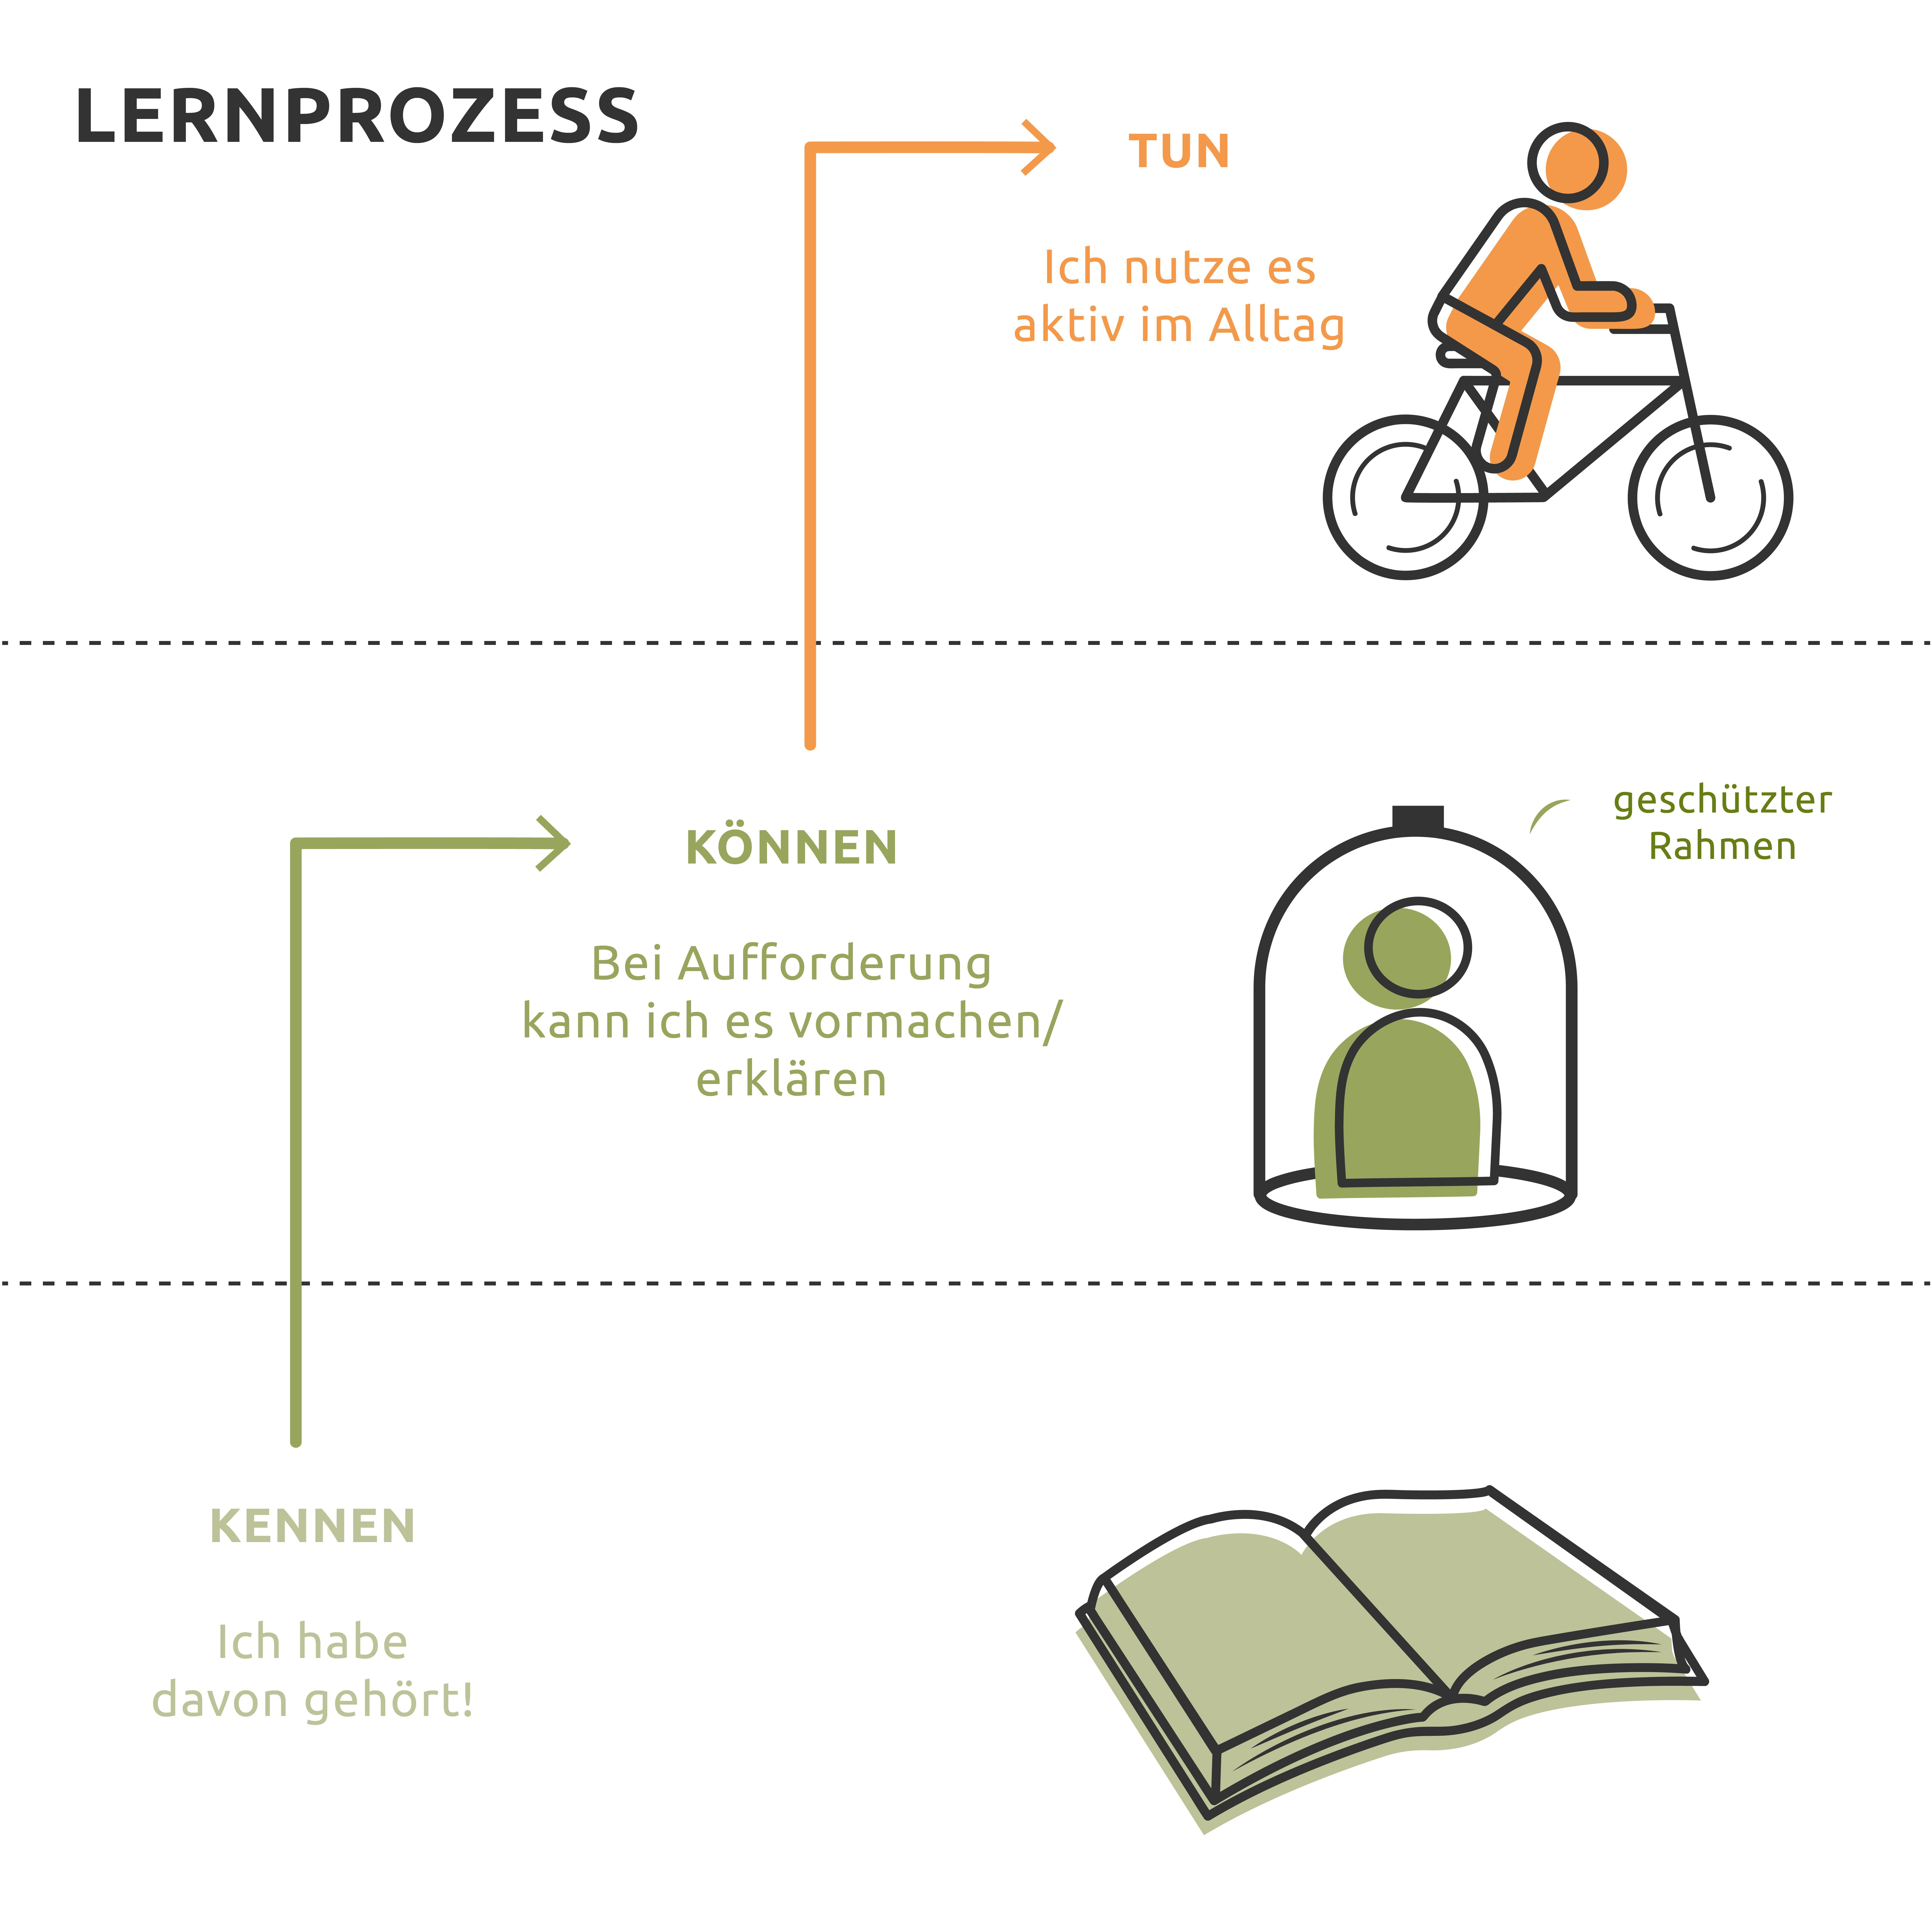 Artikel-9_Lernprozess-Grafik